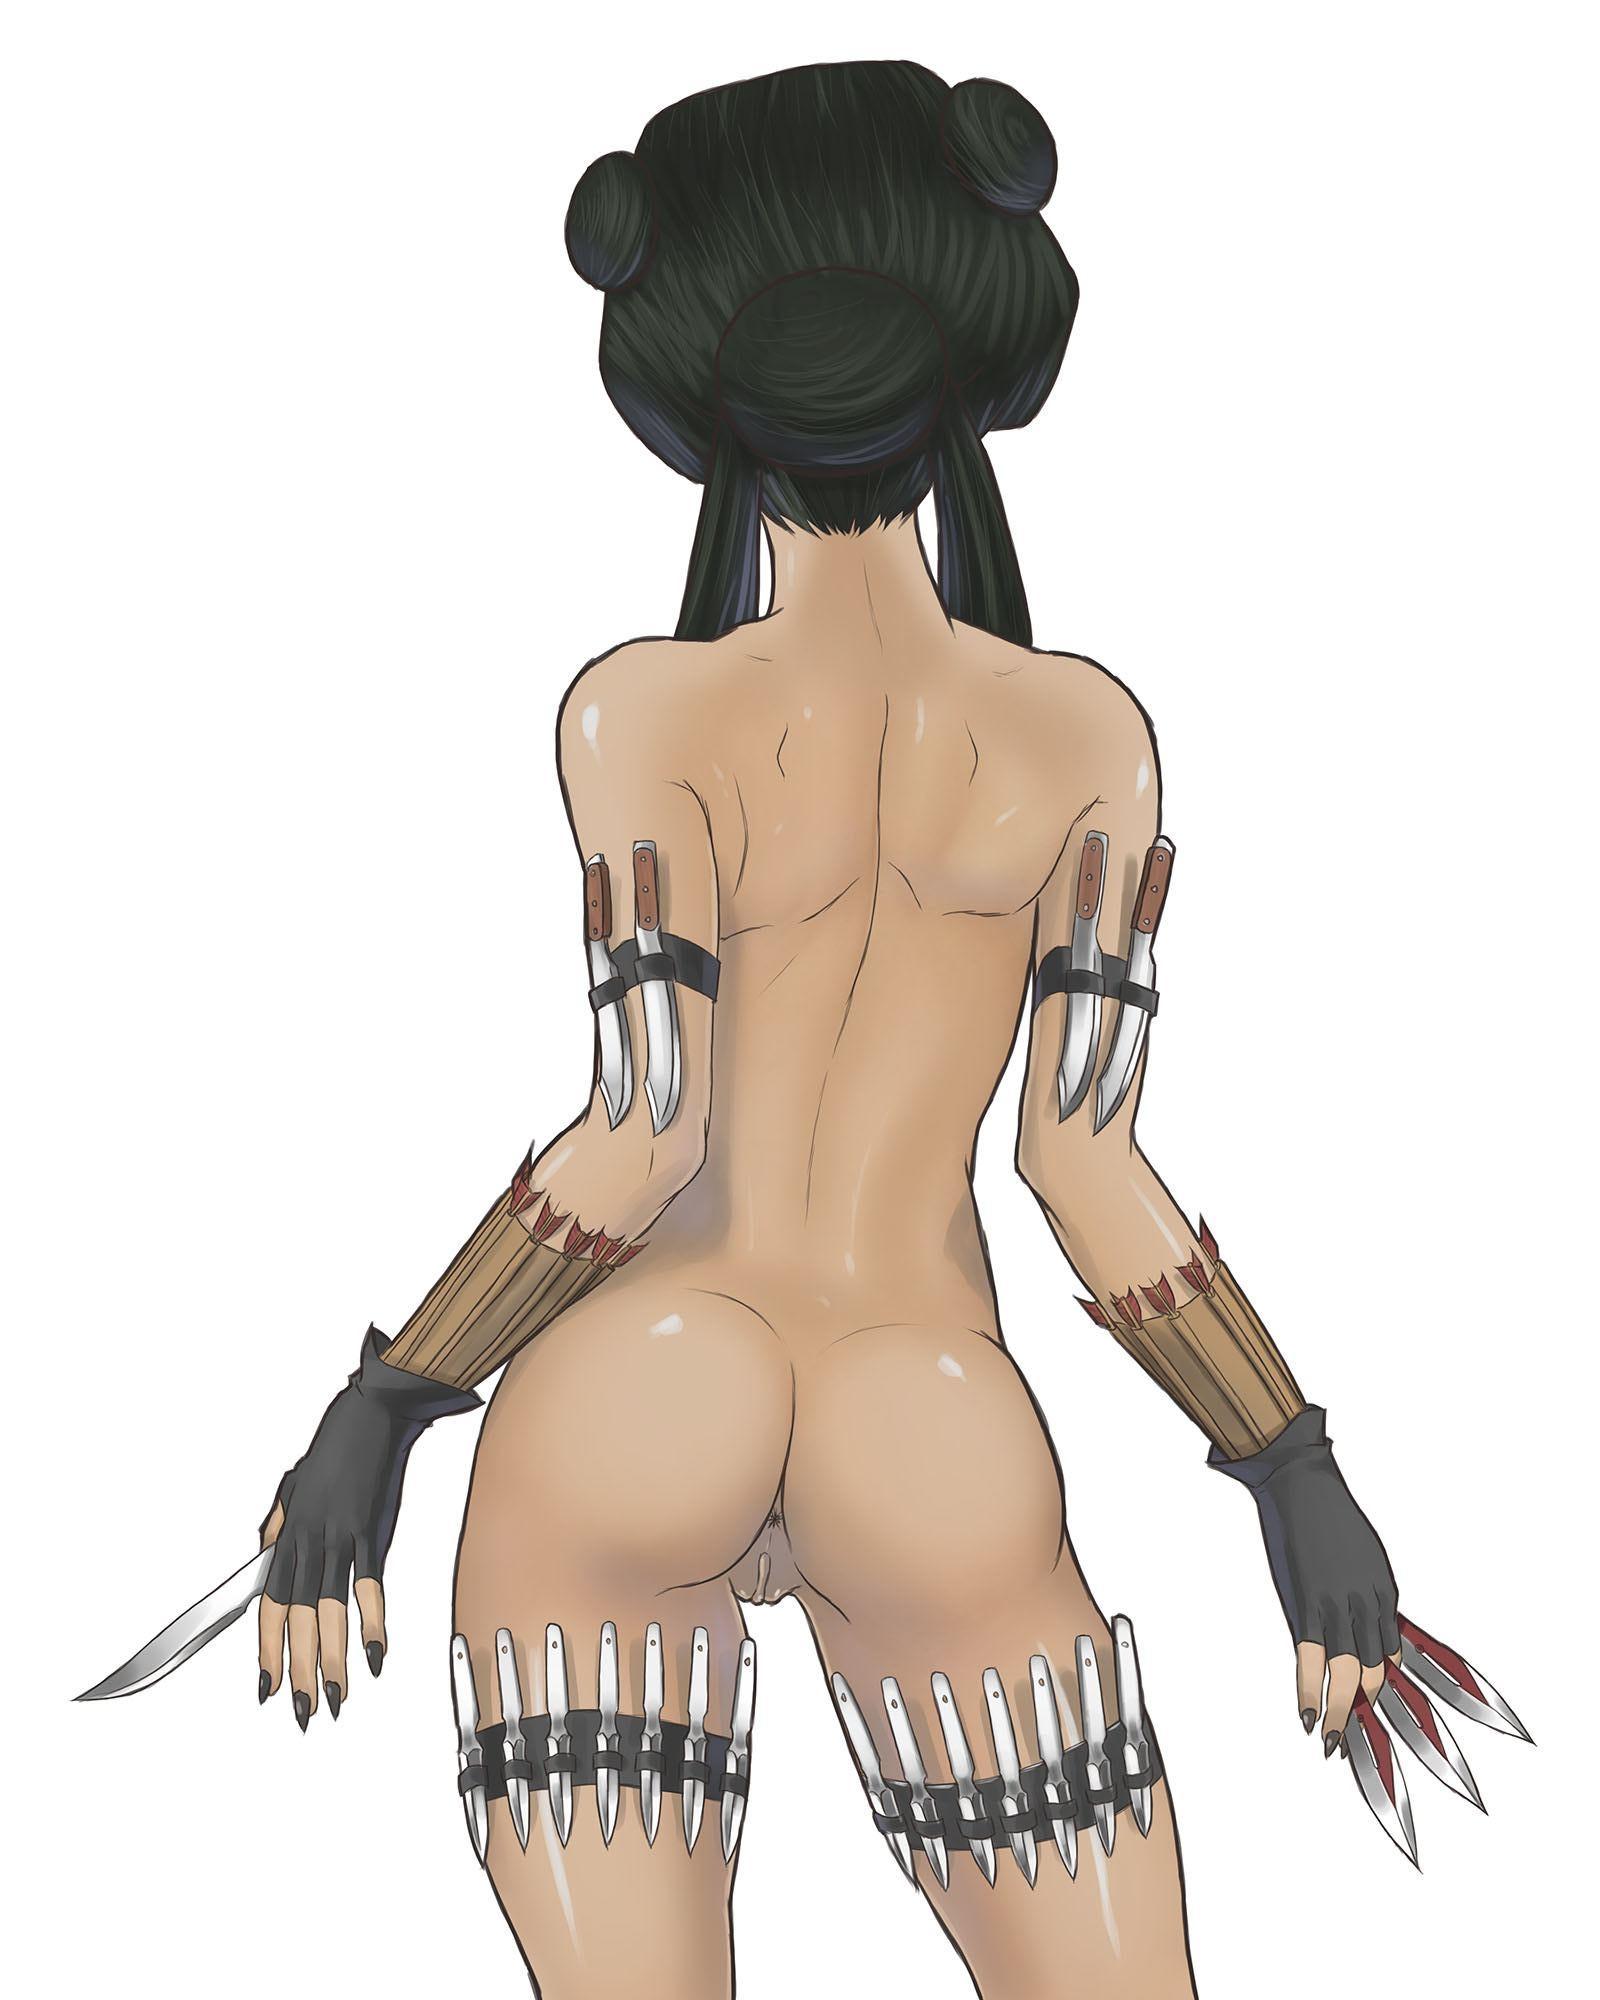 hairy-avatar-nude-hd-cowboy-nude-arnold